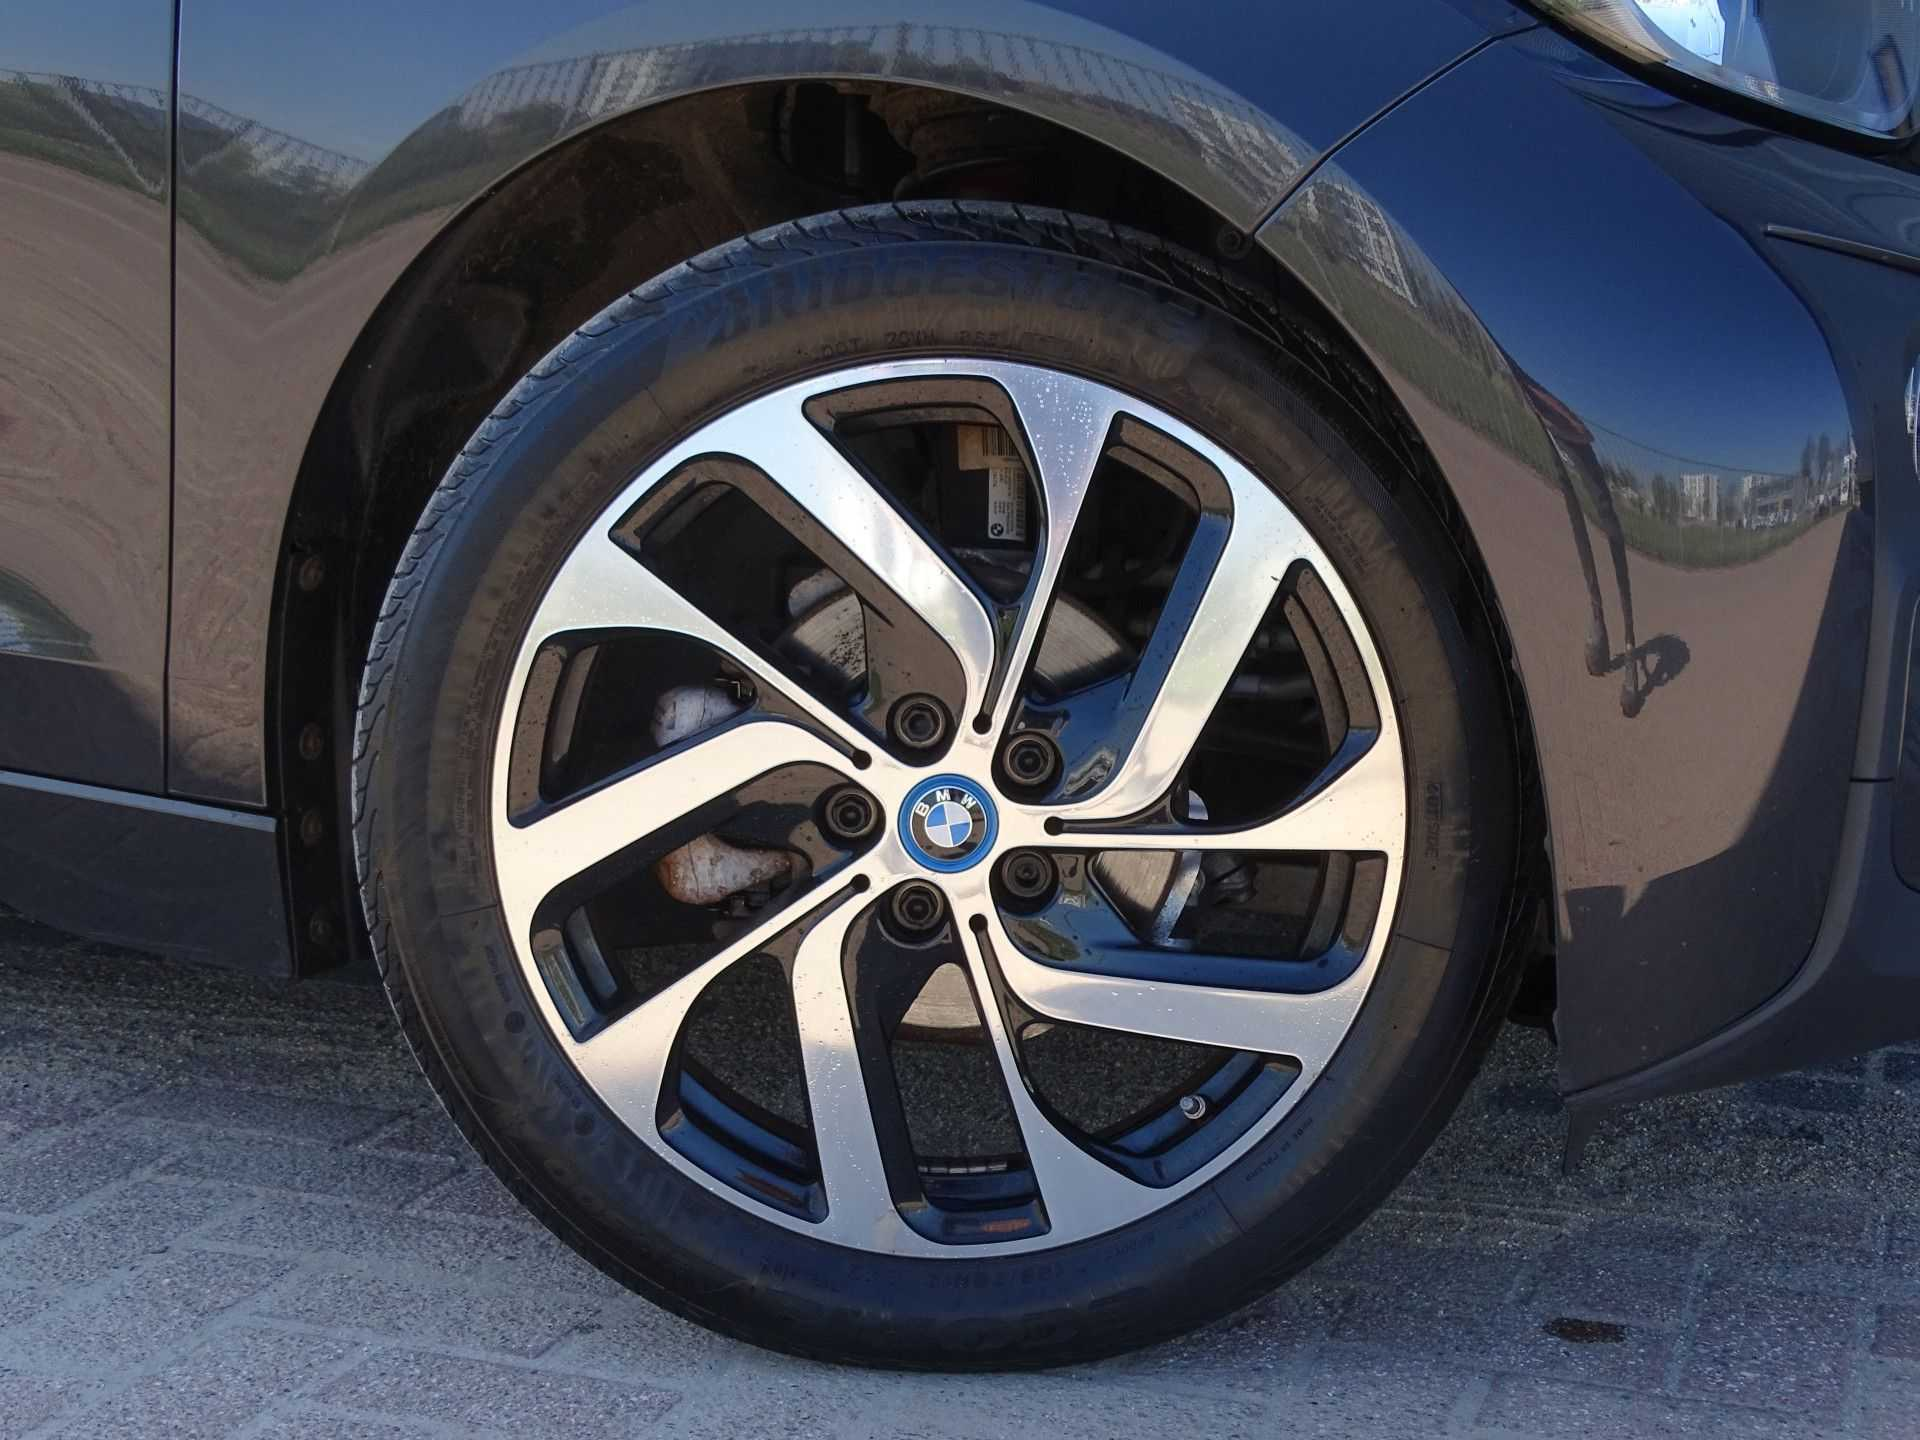 BMW i3 Basis Comfort Advance 22 kWh Marge Warmtepomp Navigatie Clima Cruise Panorama afbeelding 12